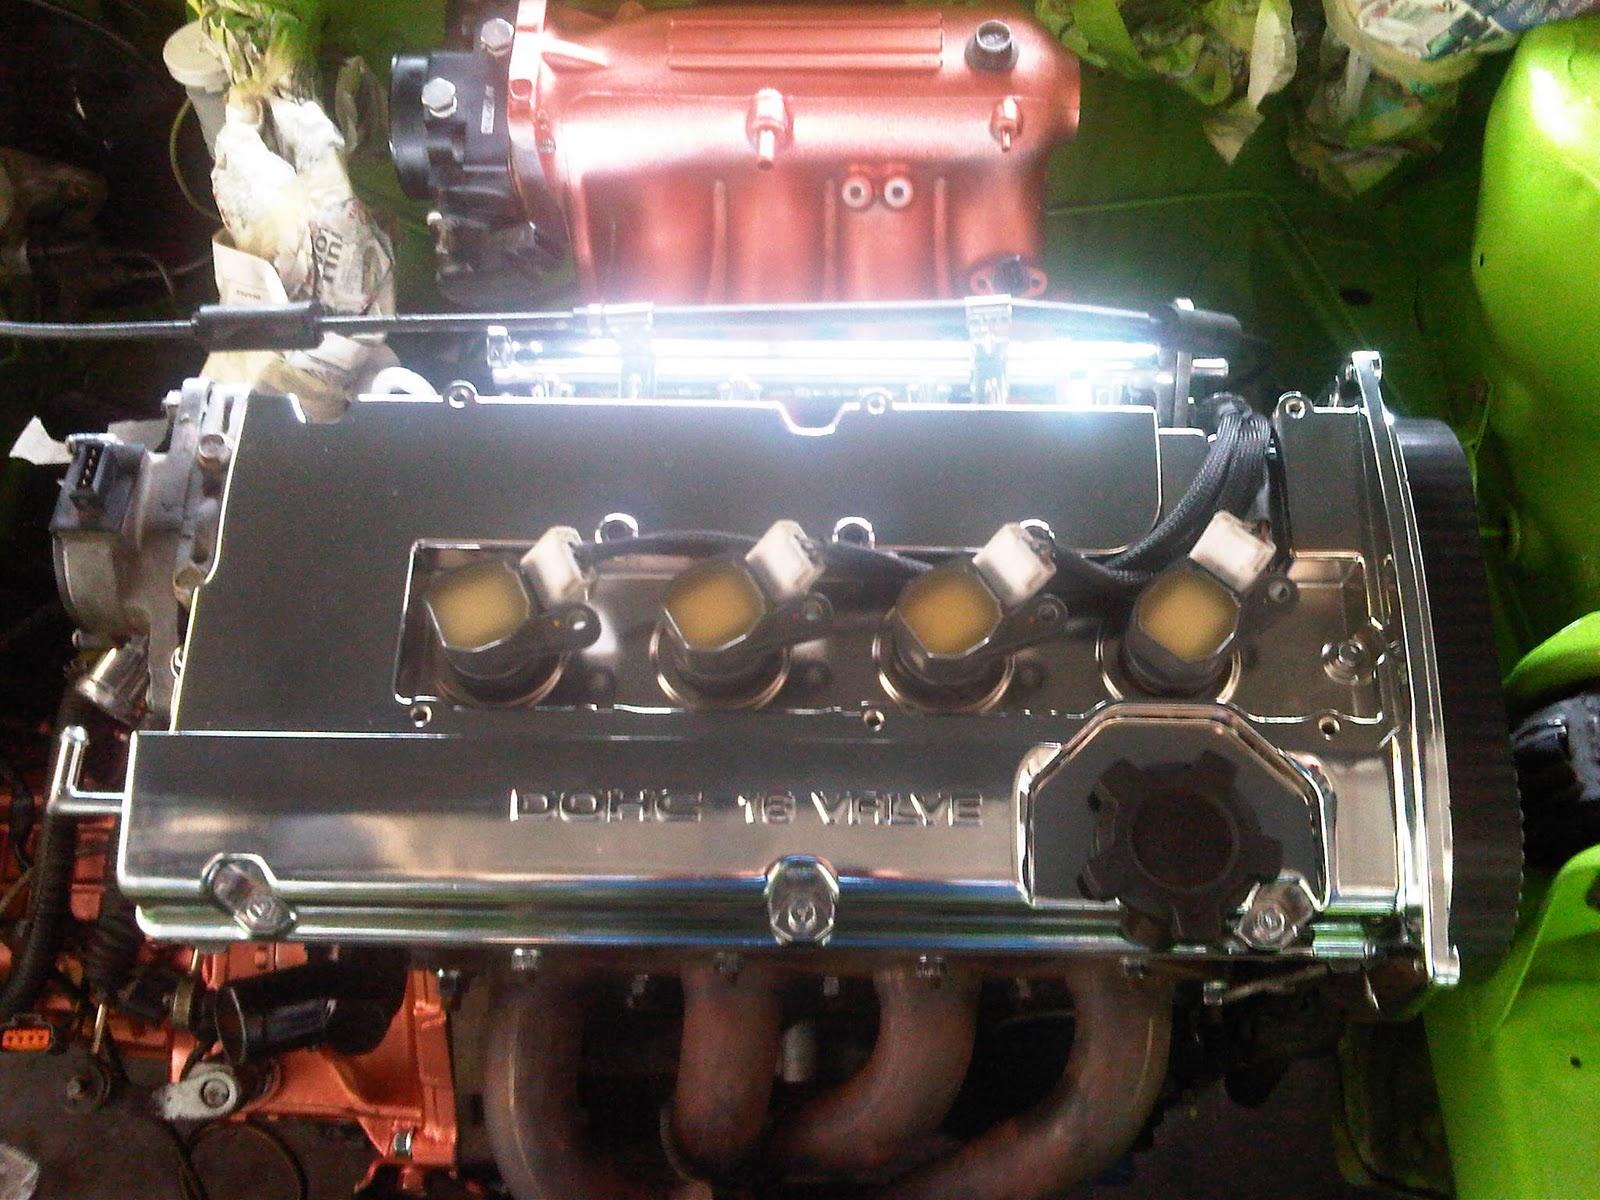 Advanced Performance Tuning: Stroker Kit 4G93 1 8L to 2 0L